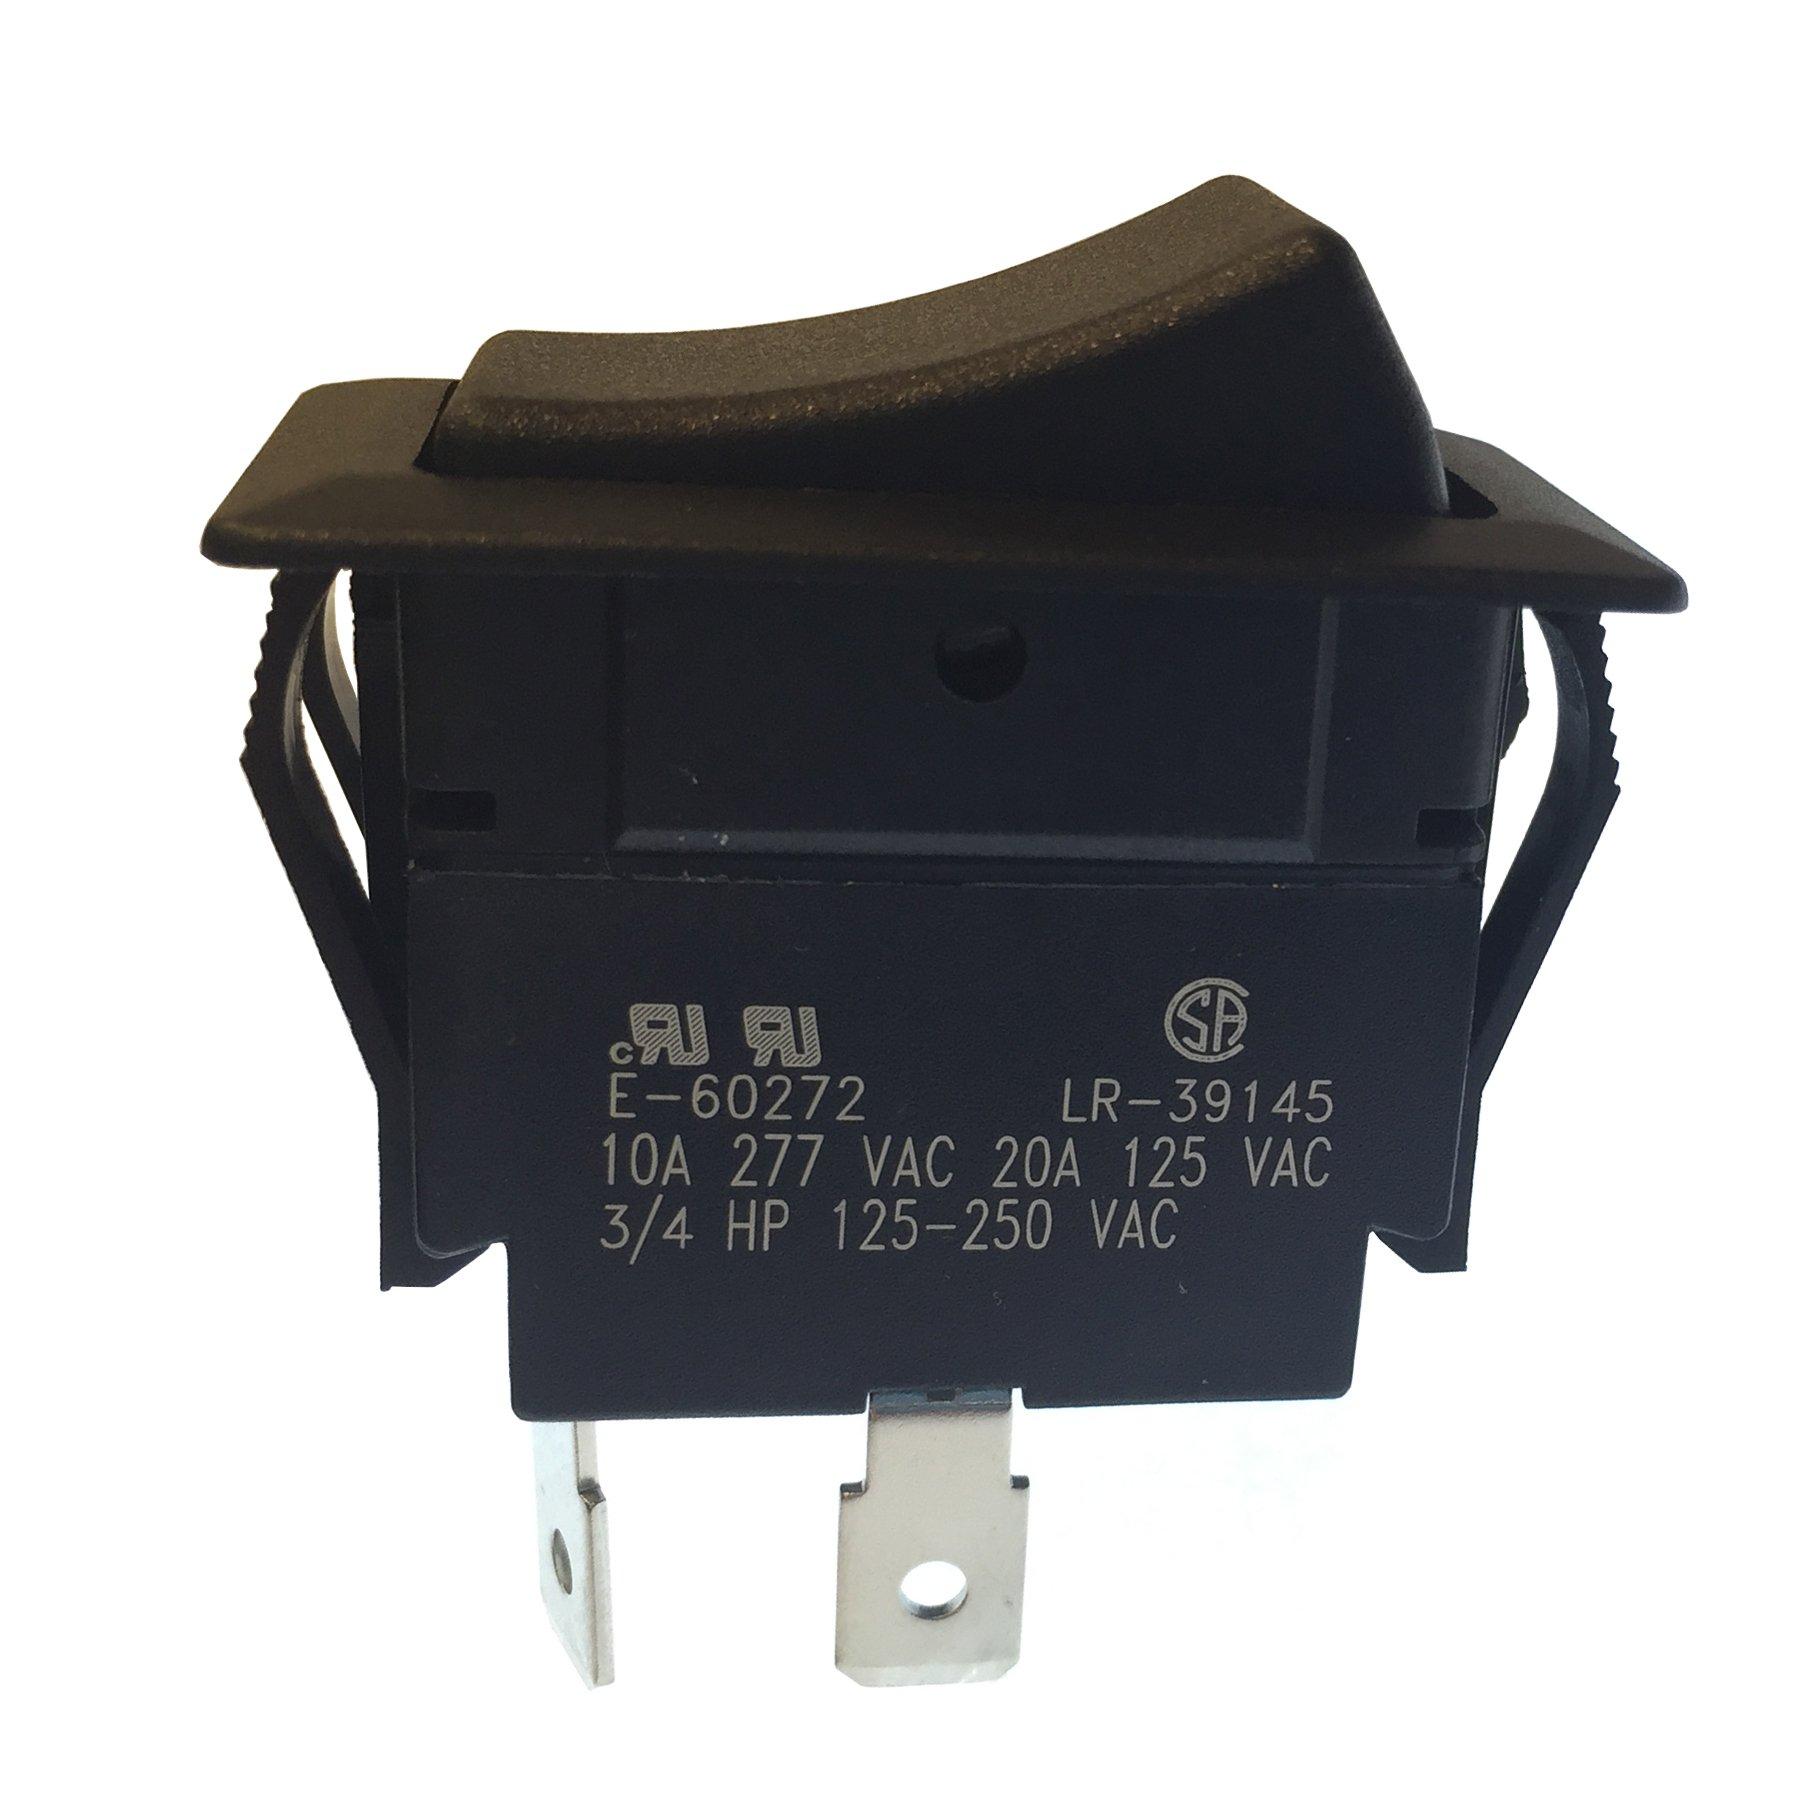 Gardner Bender GSW-45  Heavy-Duty Electrical Rocker Switch, SPST, ON-OFF,  20 A/125V AC,  Spade Terminal